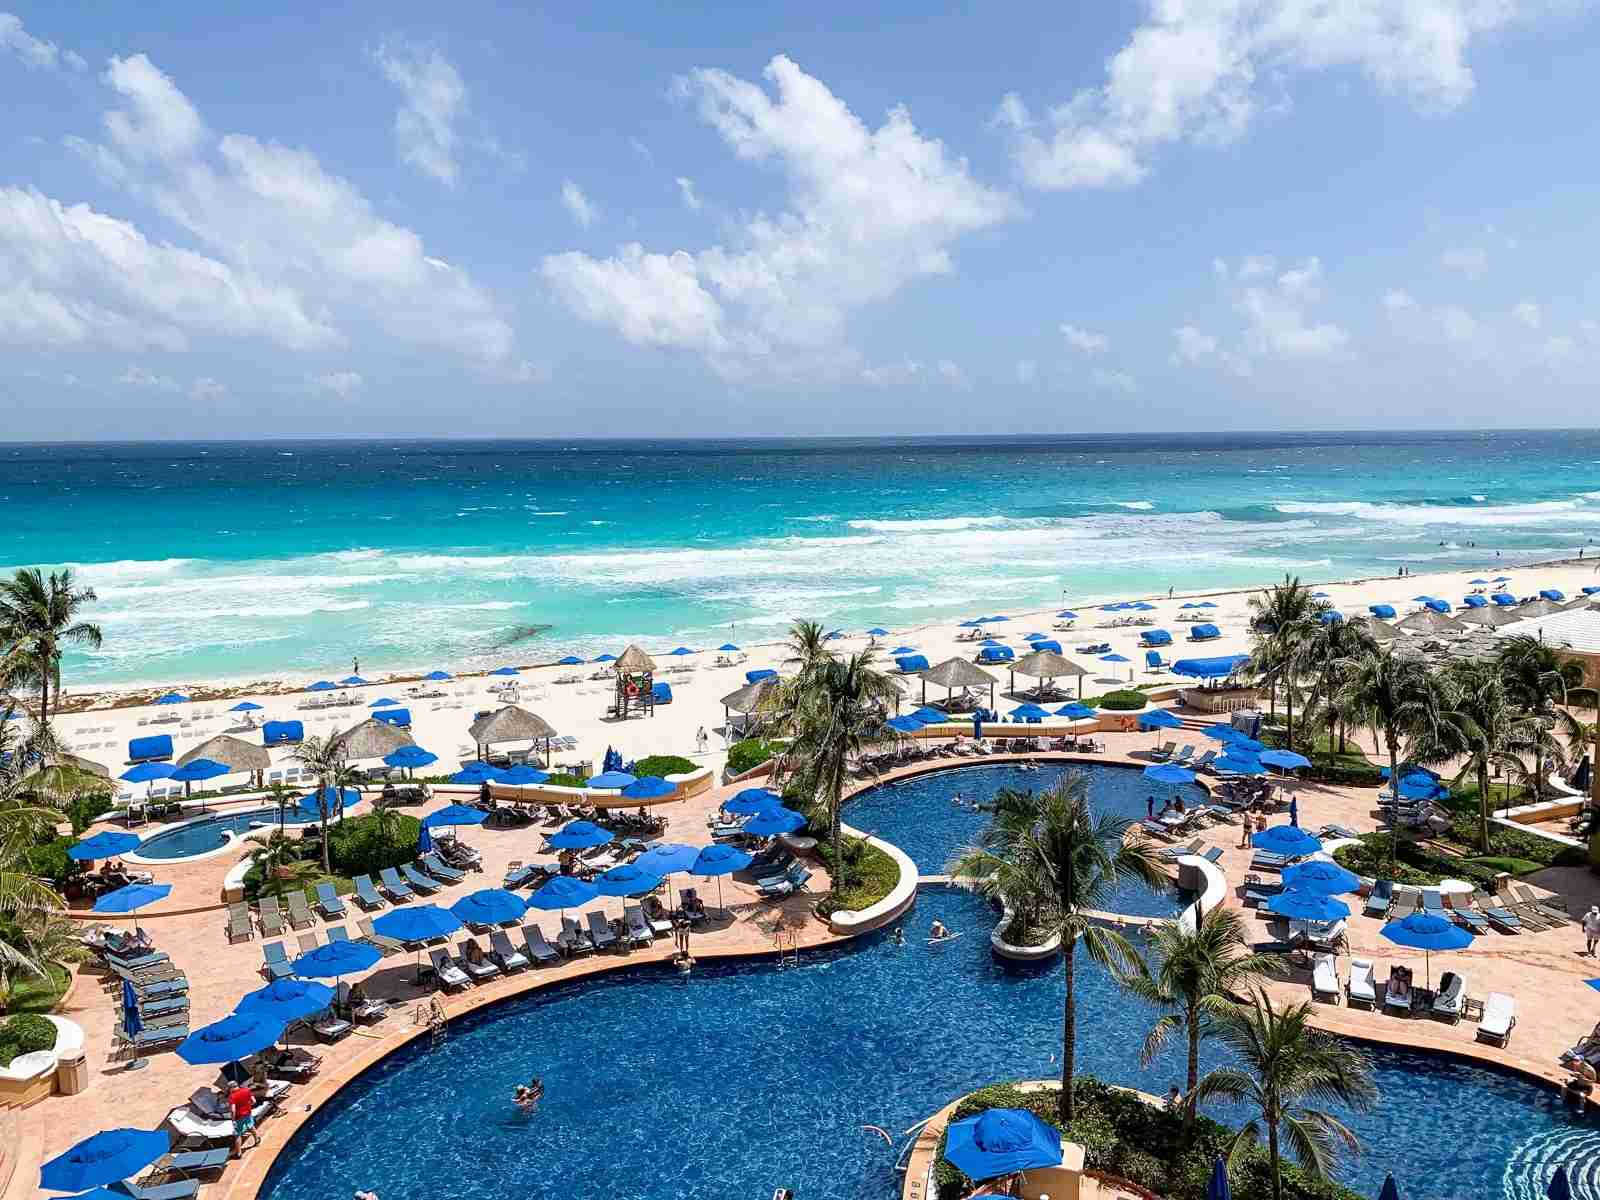 Ritz Carlton Cancun (Photo by Zach Griff / The Points Guy)